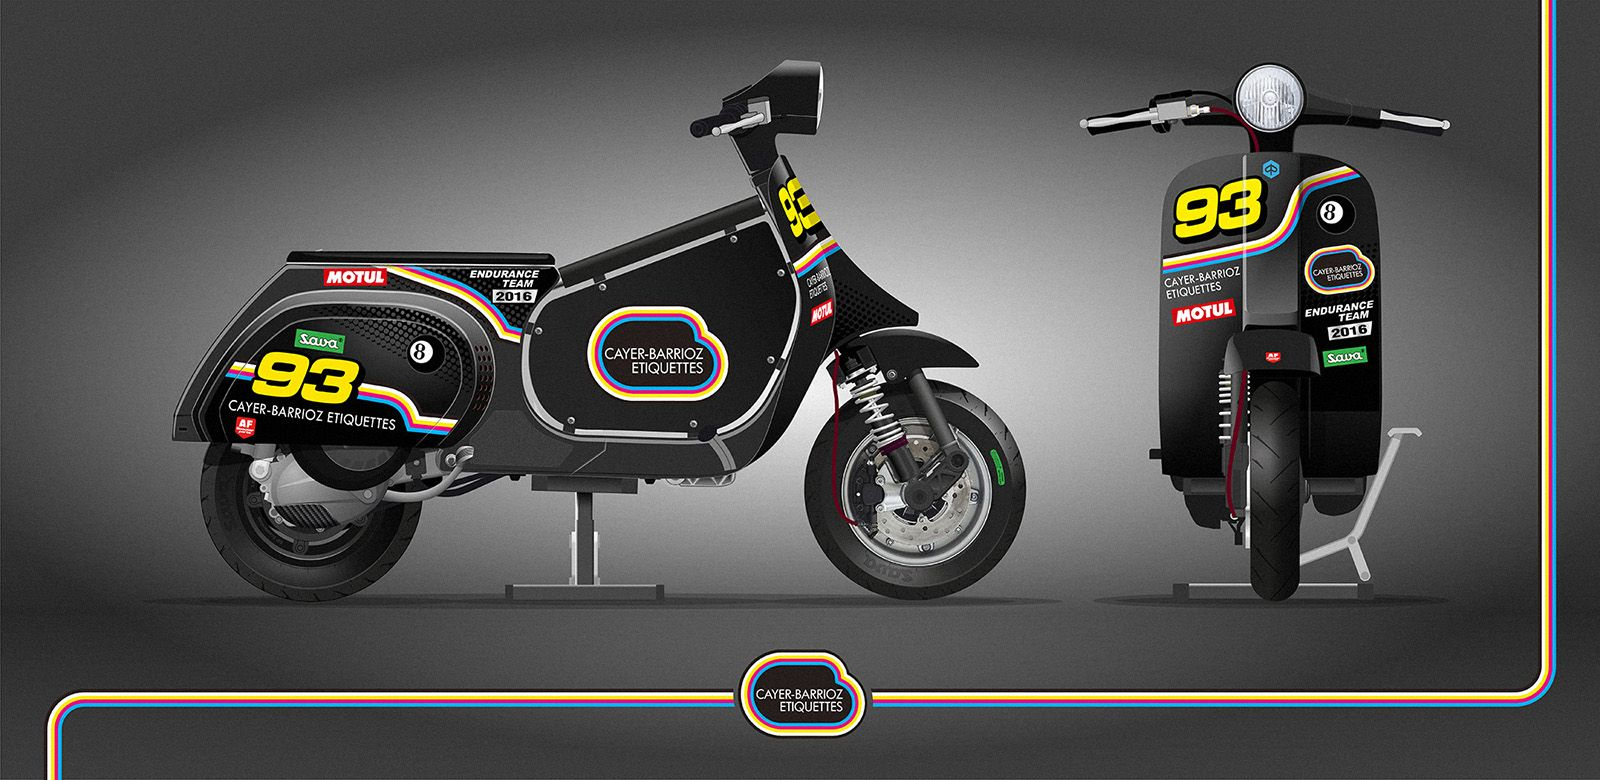 Vespa cayer barrioz 2016 motos vespa smallframe vespa